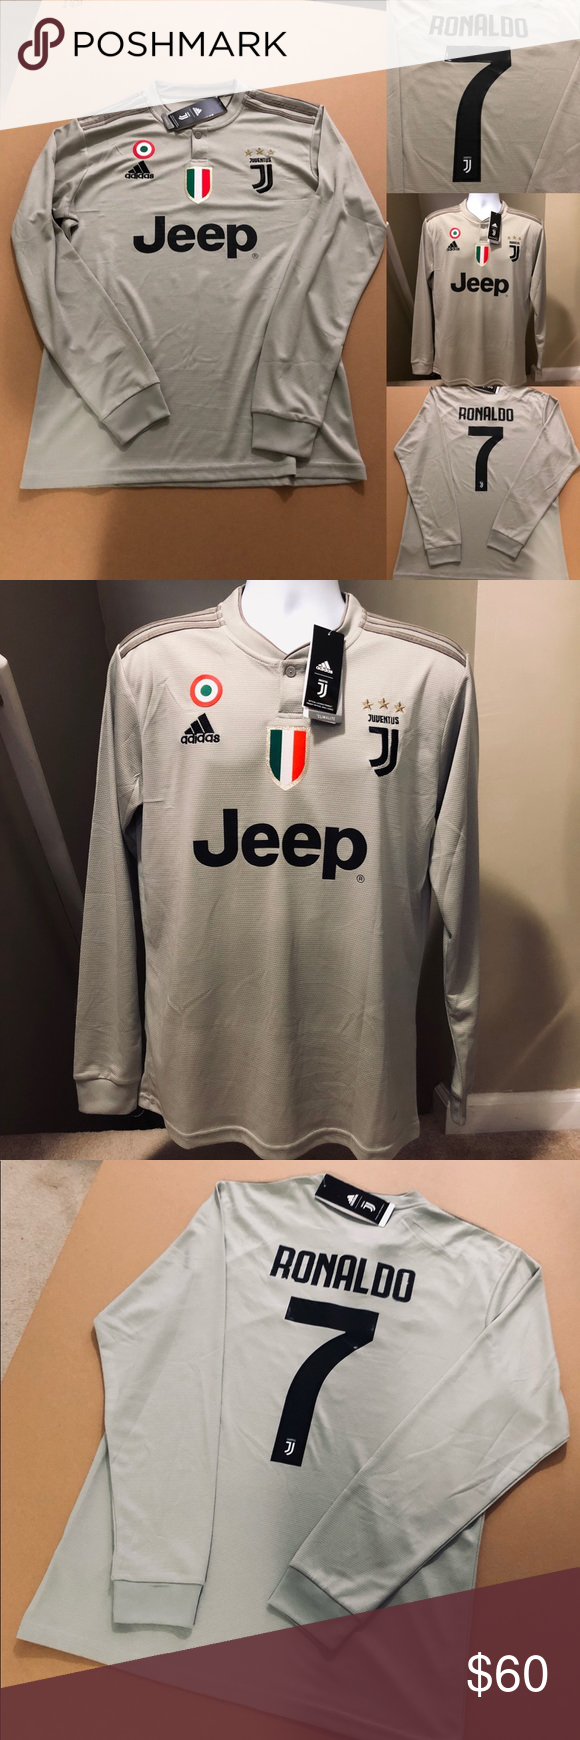 21e404b76 Cristiano Ronaldo  7 Away Juventus Soccer Jersey 2018-19 Juventus Football  Club • Futbol Soccer Jersey Football 2018 Away Tan Grey Juventus Soccer  Jersey ...